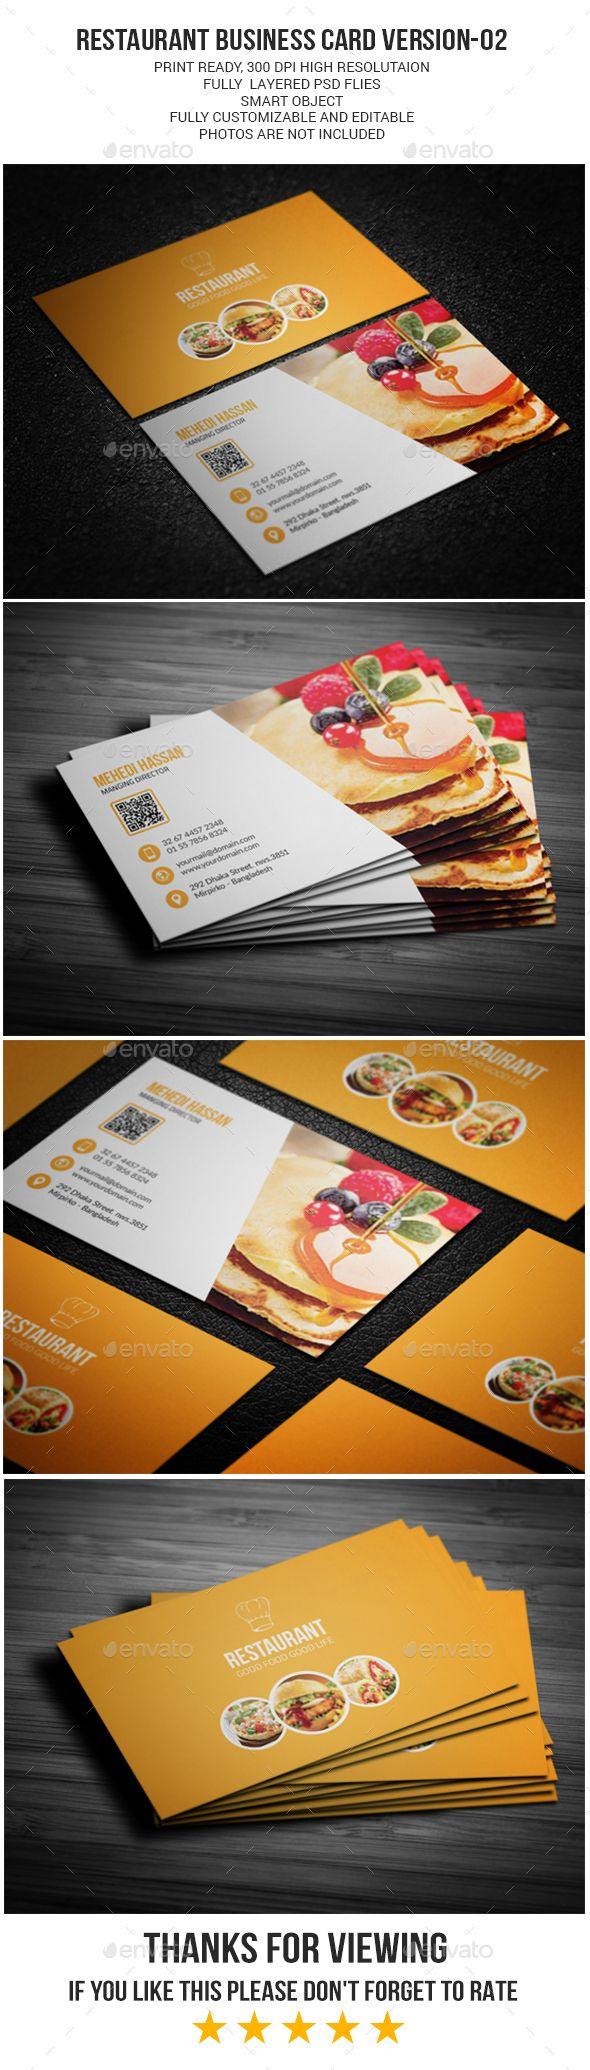 2859 best business card template design images on pinterest restaurant business card version 02 magicingreecefo Choice Image